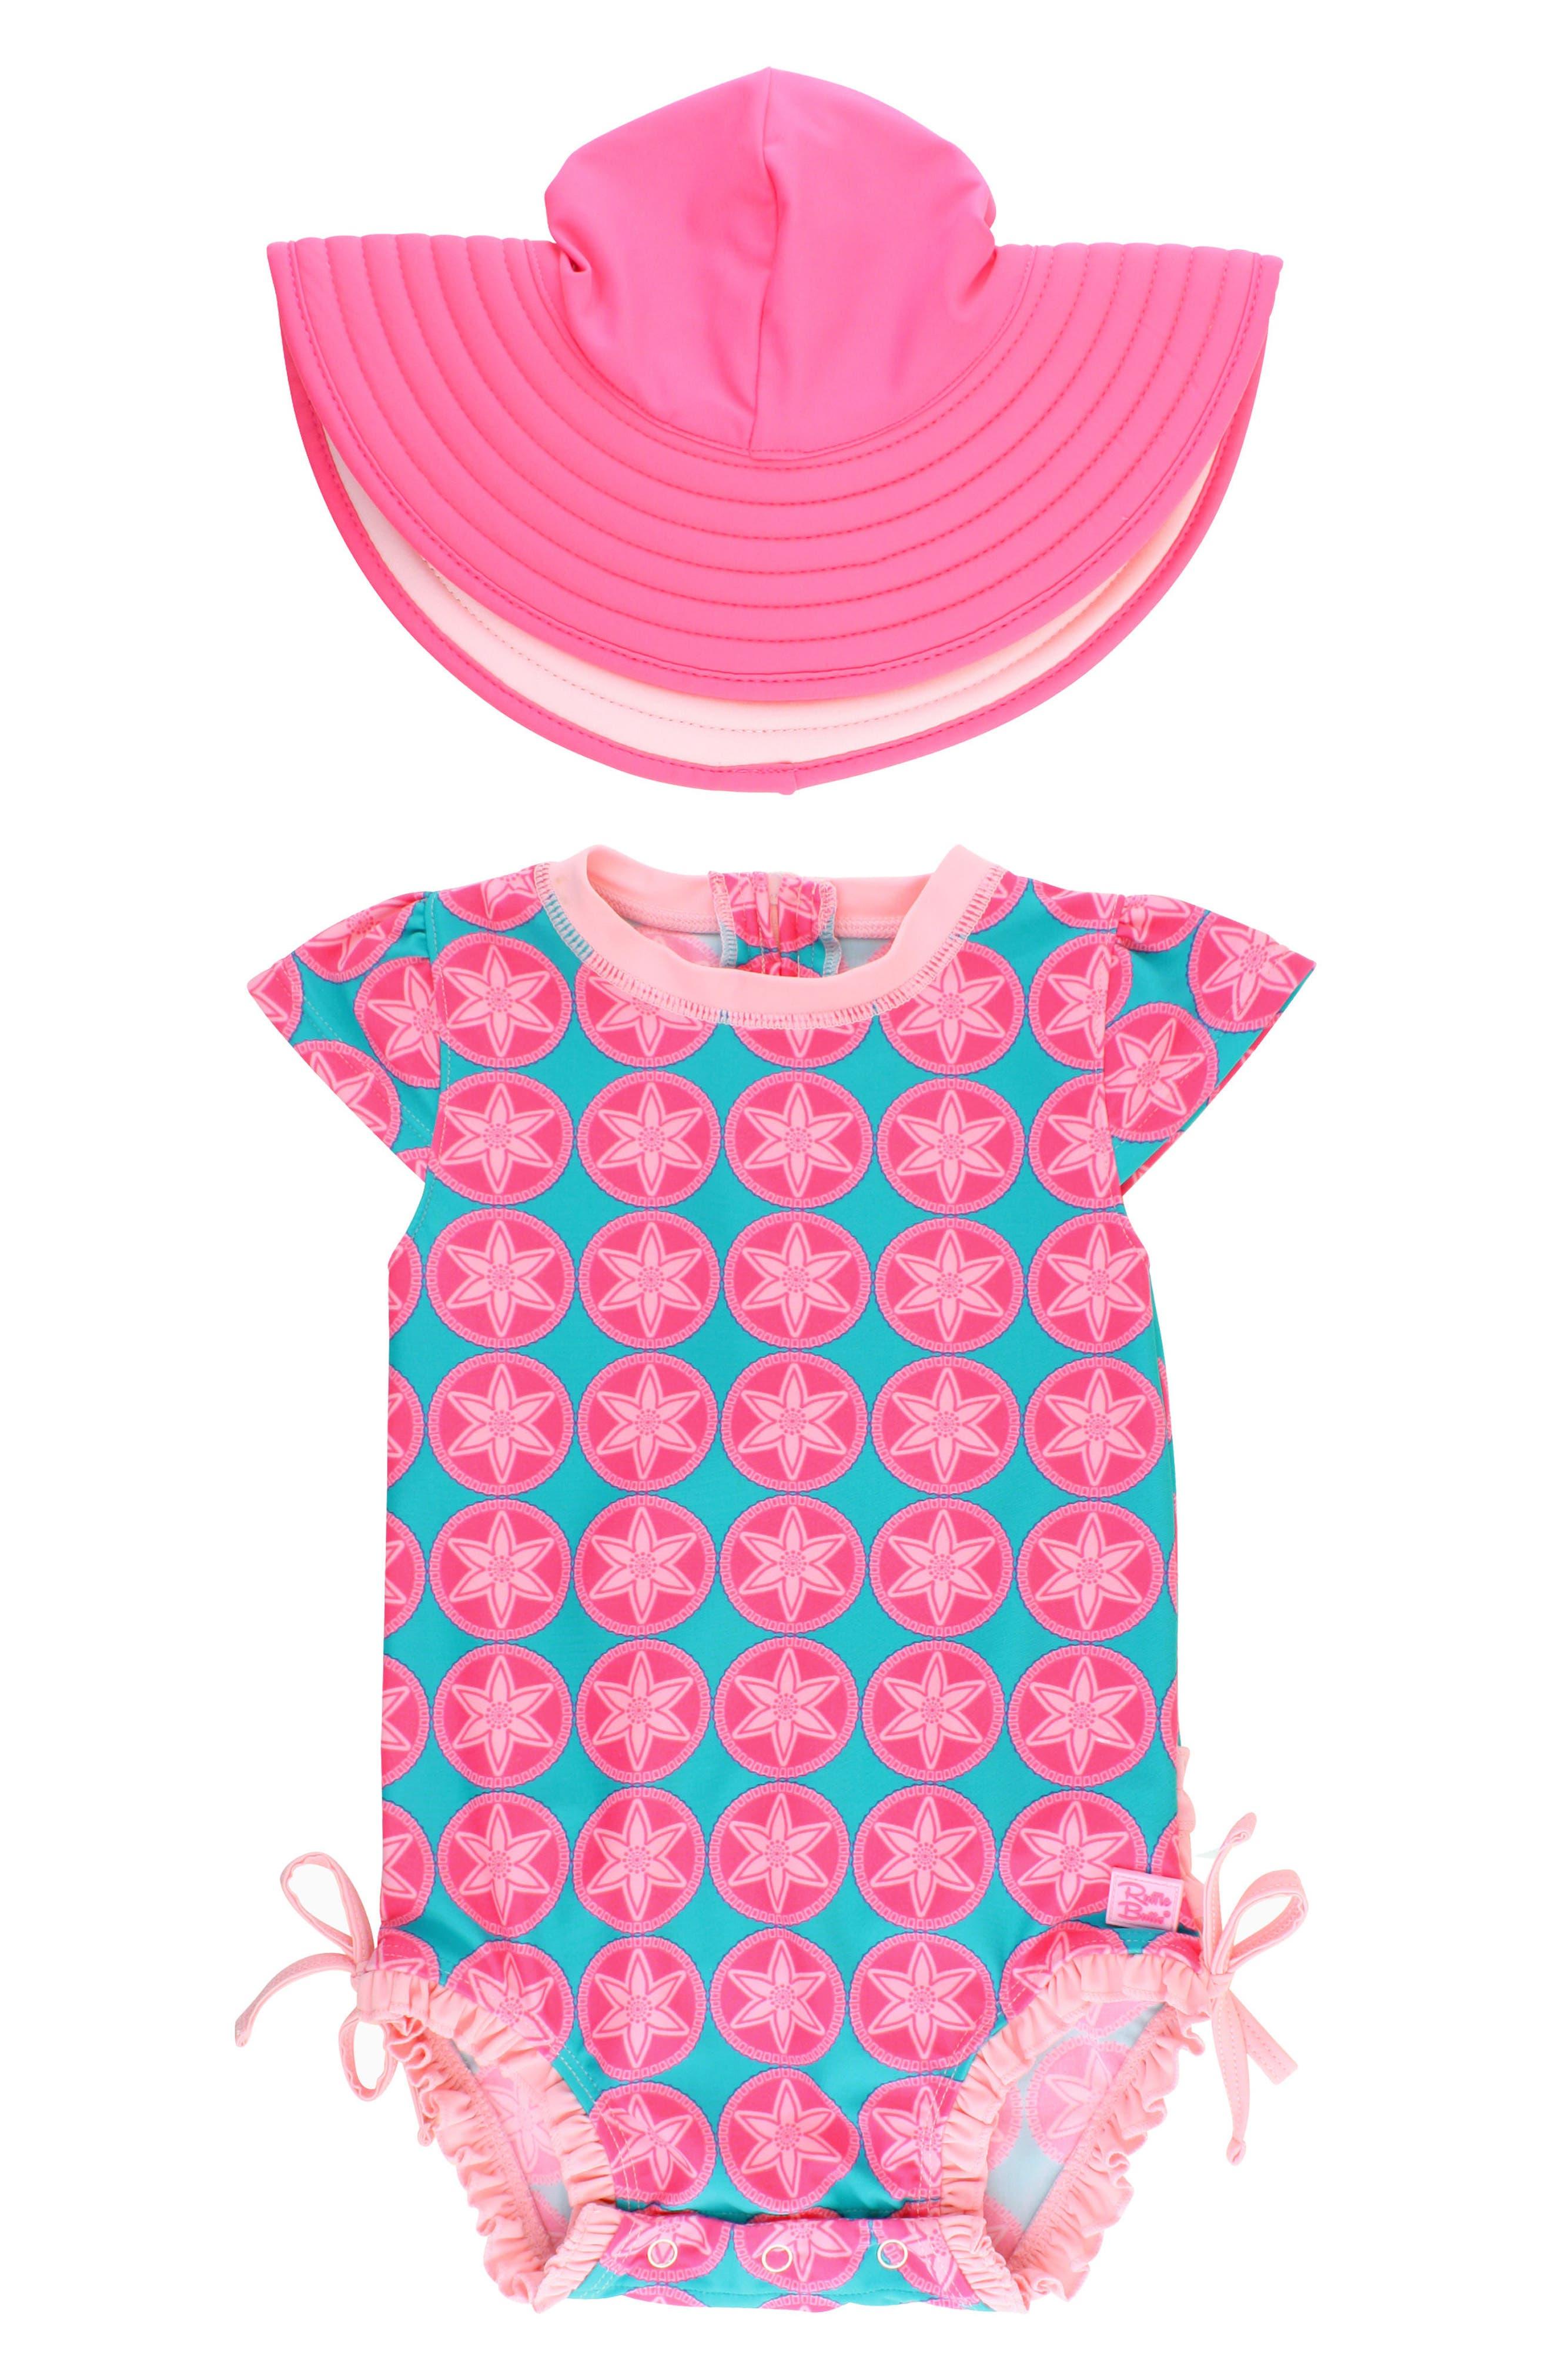 Main Image - RuffleButts Salt Water Taffy One-Piece Swimsuit & Hat Set (Baby Girls)